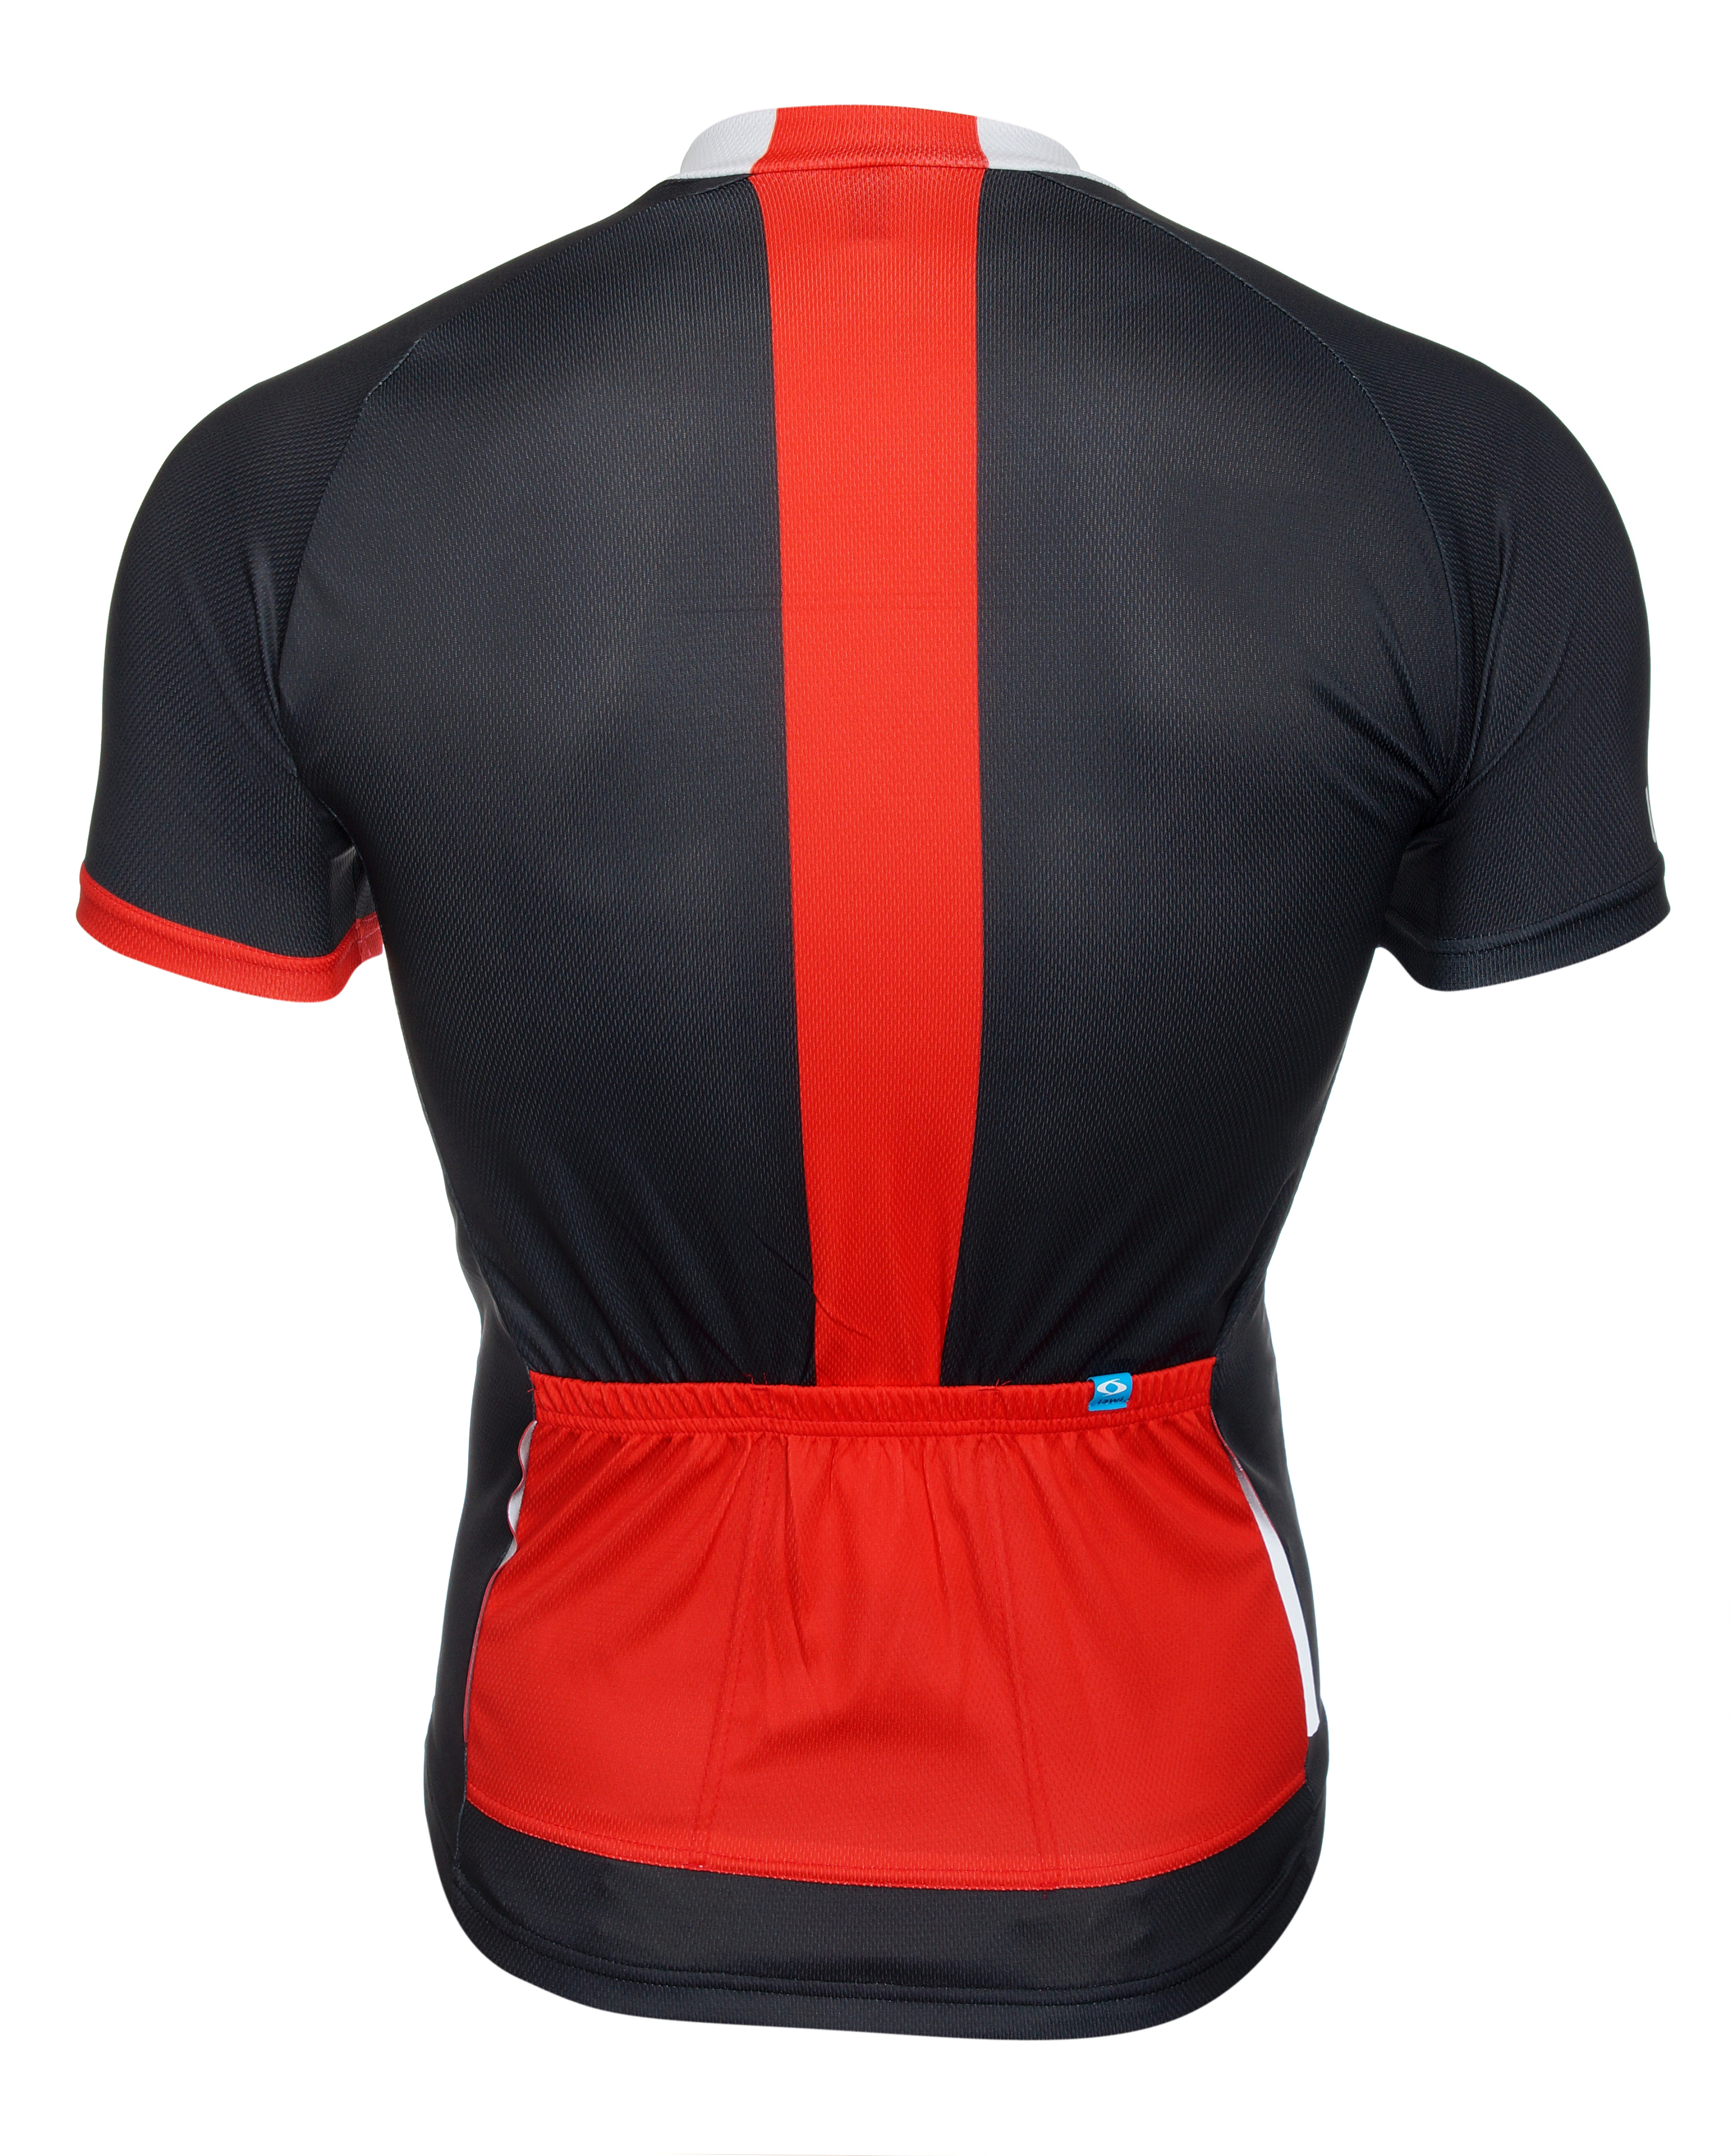 Pánský cyklistický dres Tint-in Red velikost XXXXL be8ff05548